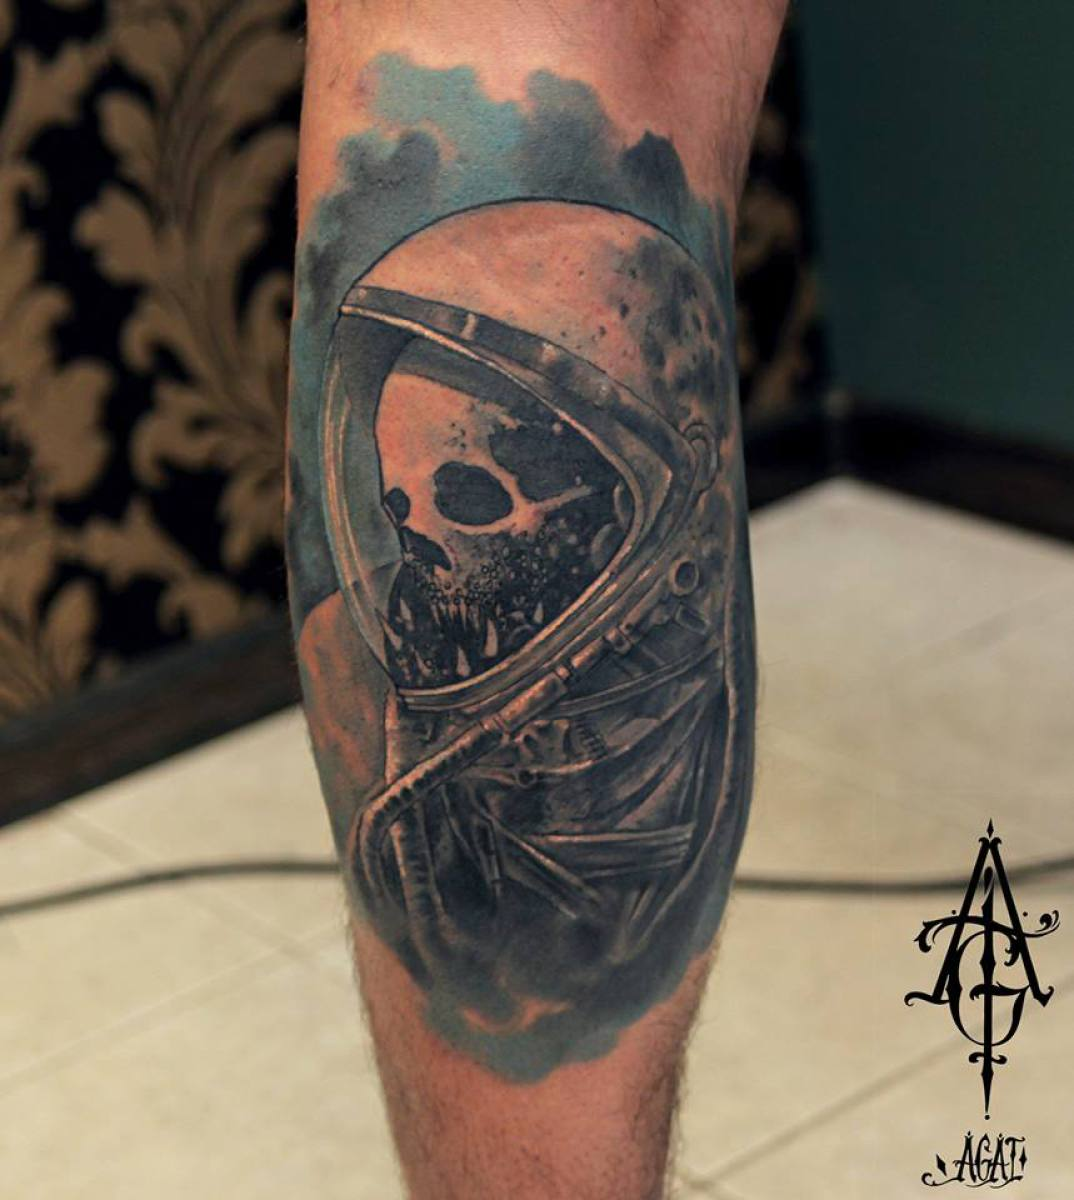 Dead Astronaut Skull tattoo by Agat Artemji